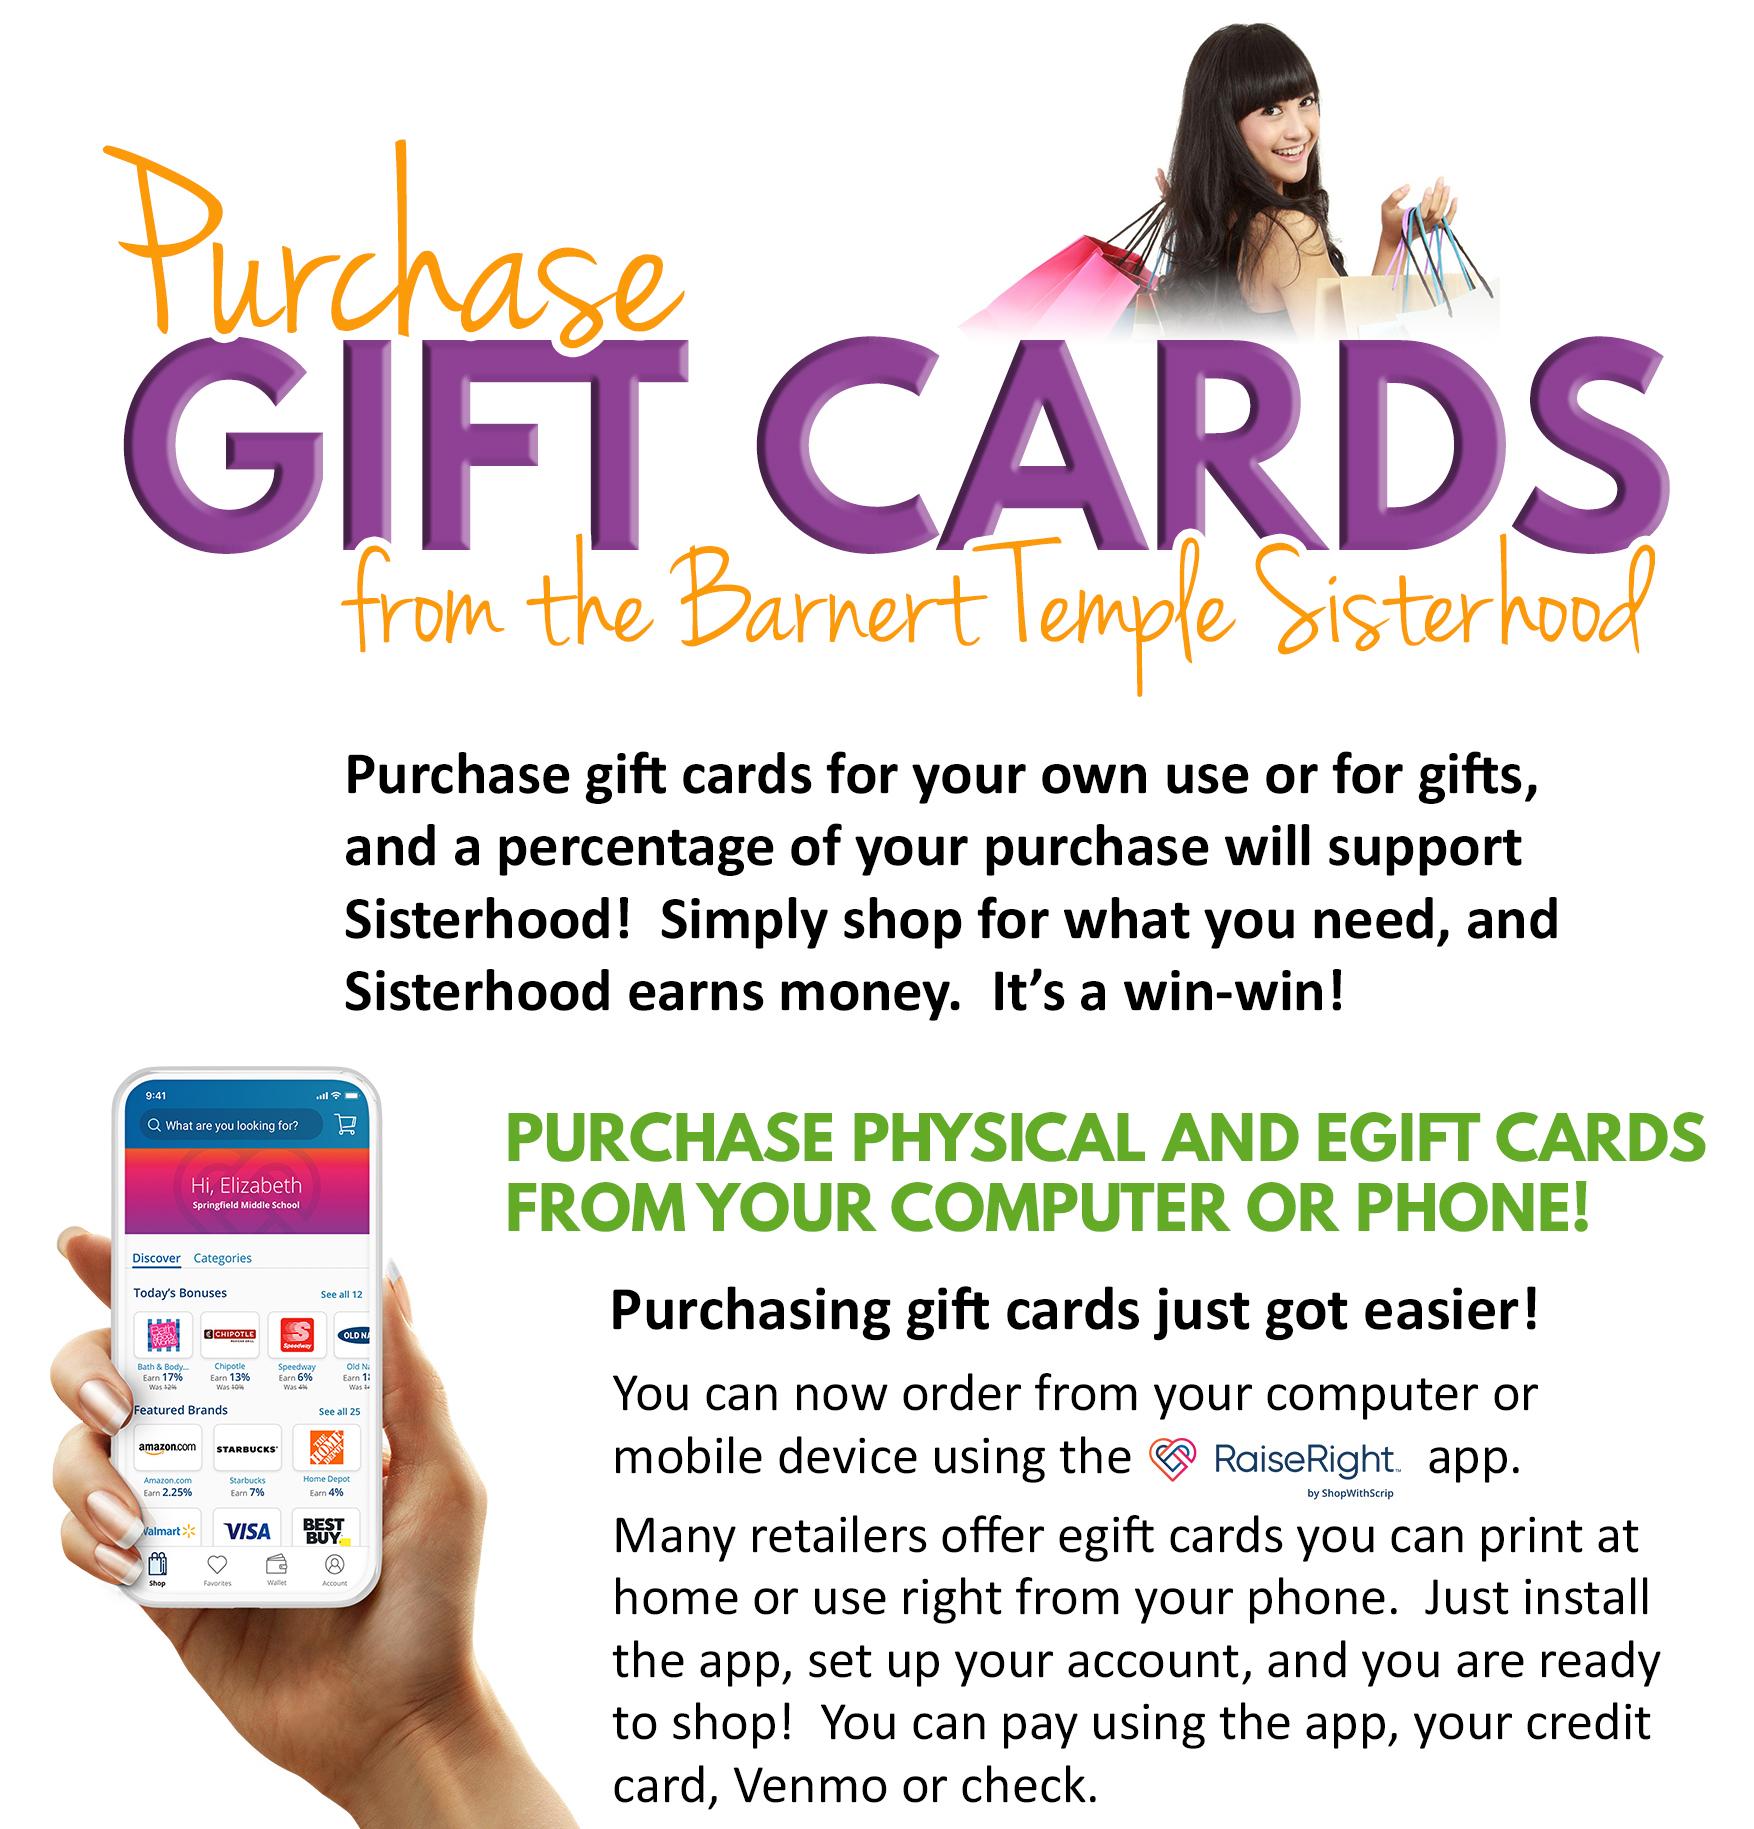 New Gift Card App Description